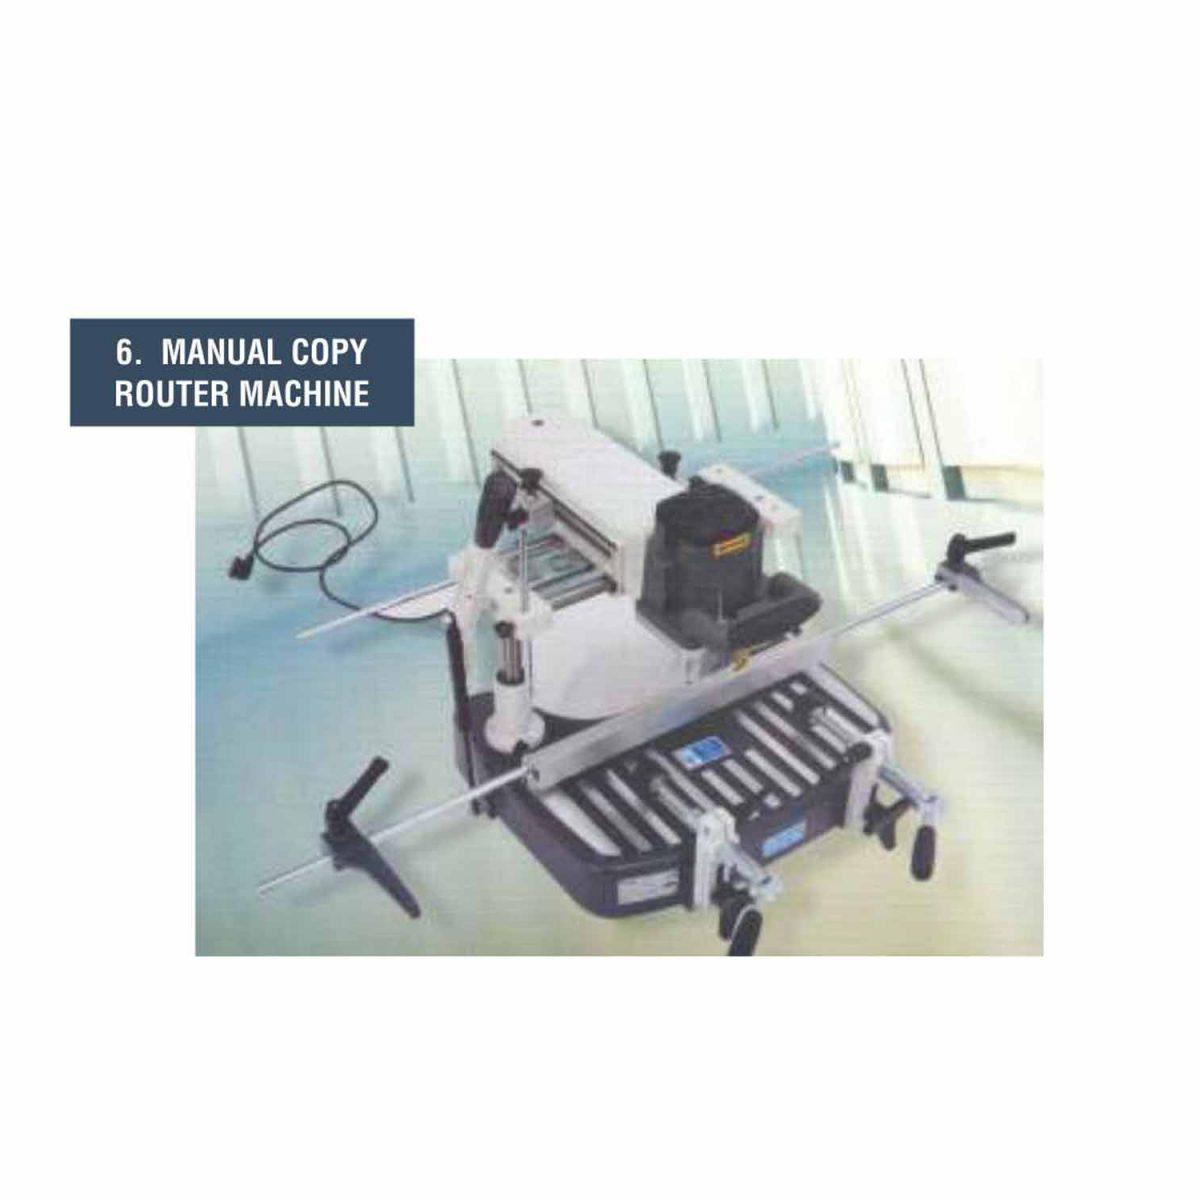 Manual Copy Router Machine